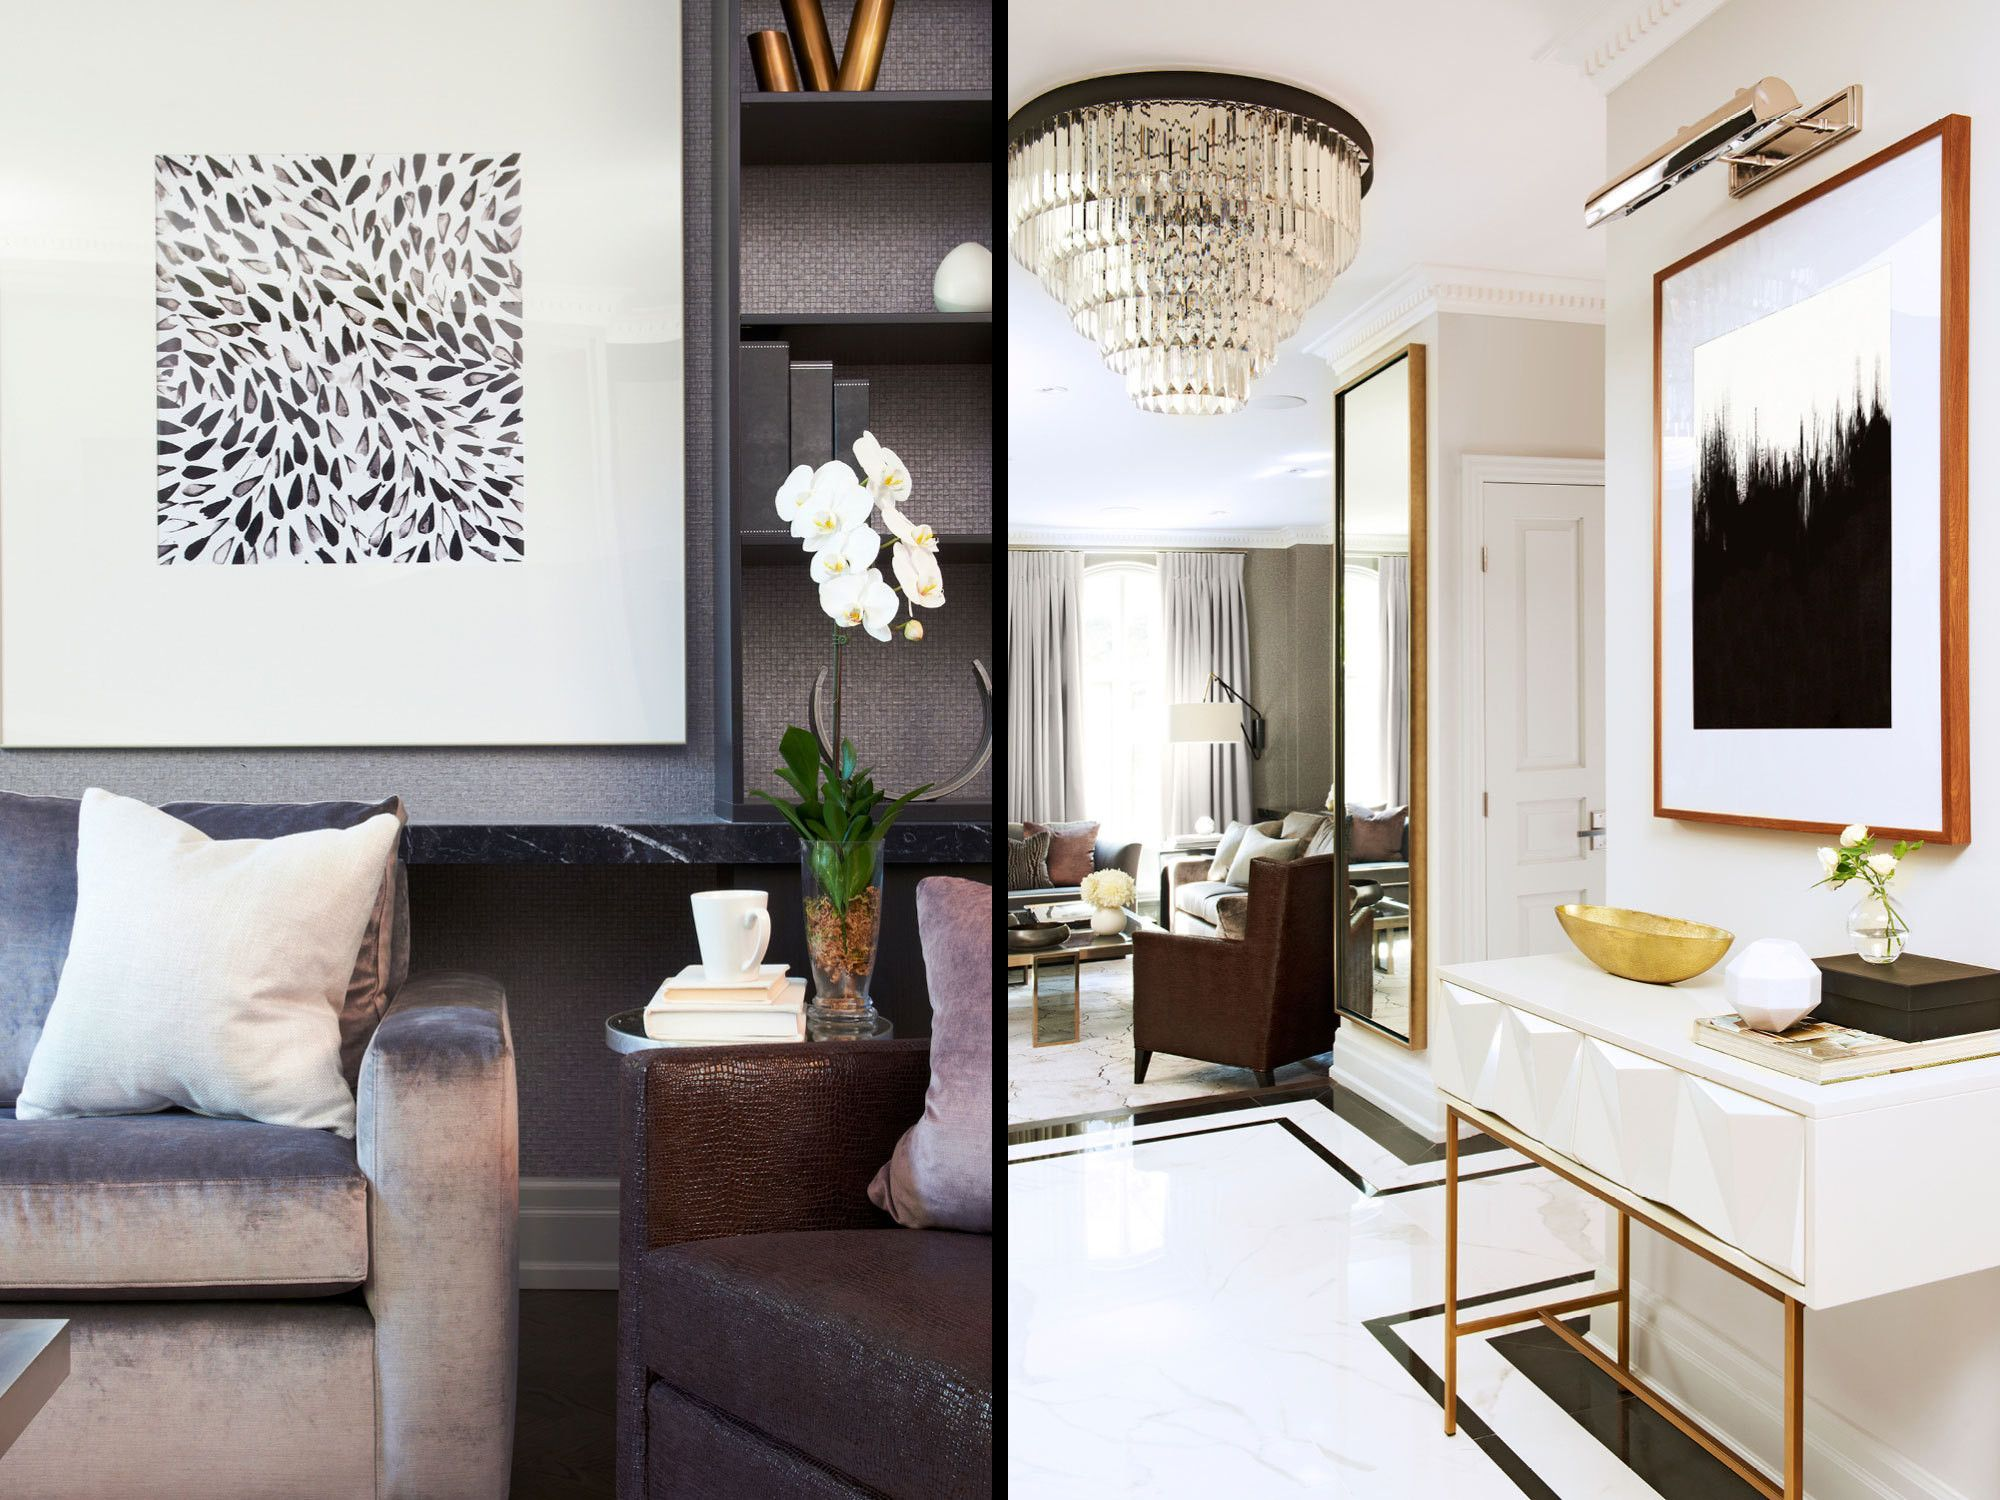 Modern hallway furniture ideas  A Sleek Modern Home That Blends Warmth and Style  Toronto Modern